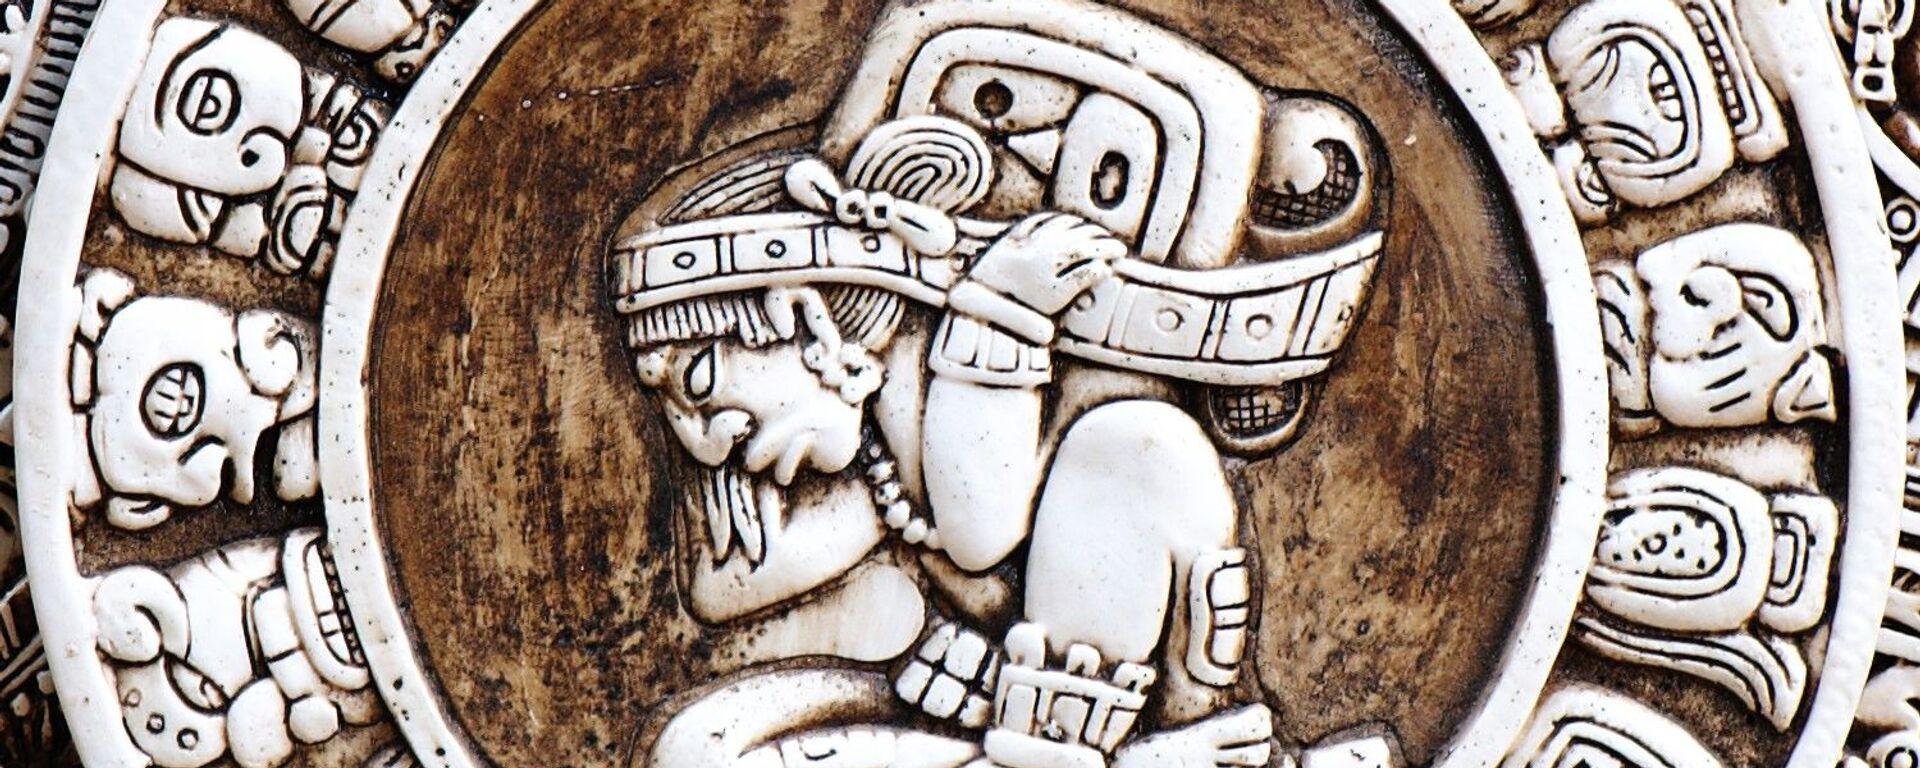 El calendario maya - Sputnik Mundo, 1920, 17.06.2020